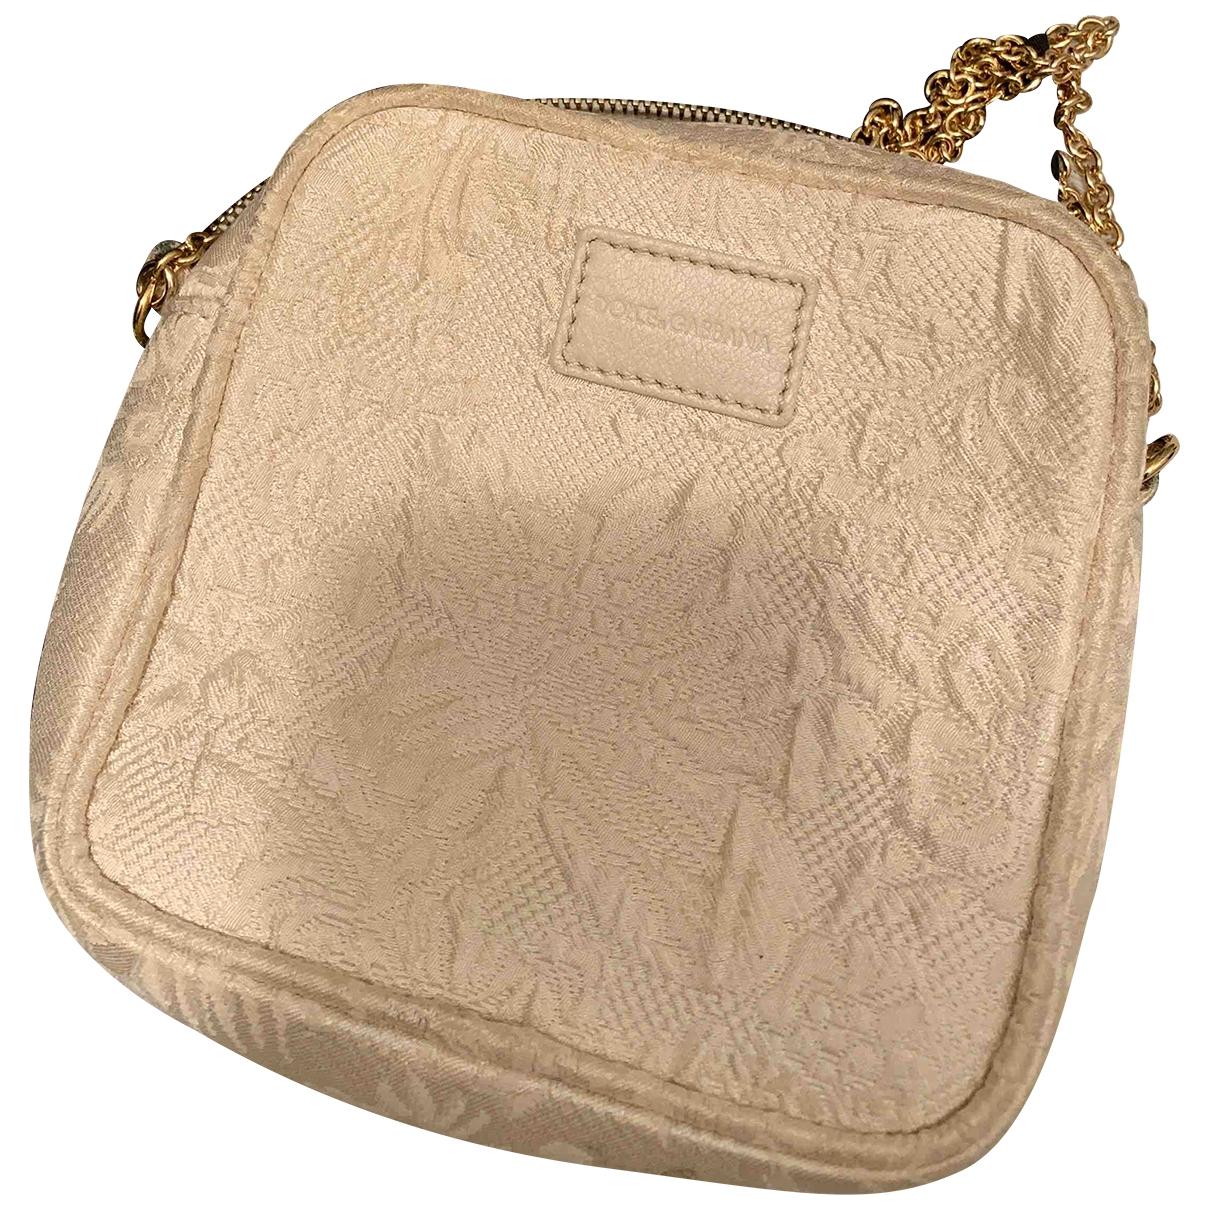 Bolsos clutch en Algodon Beige Dolce & Gabbana